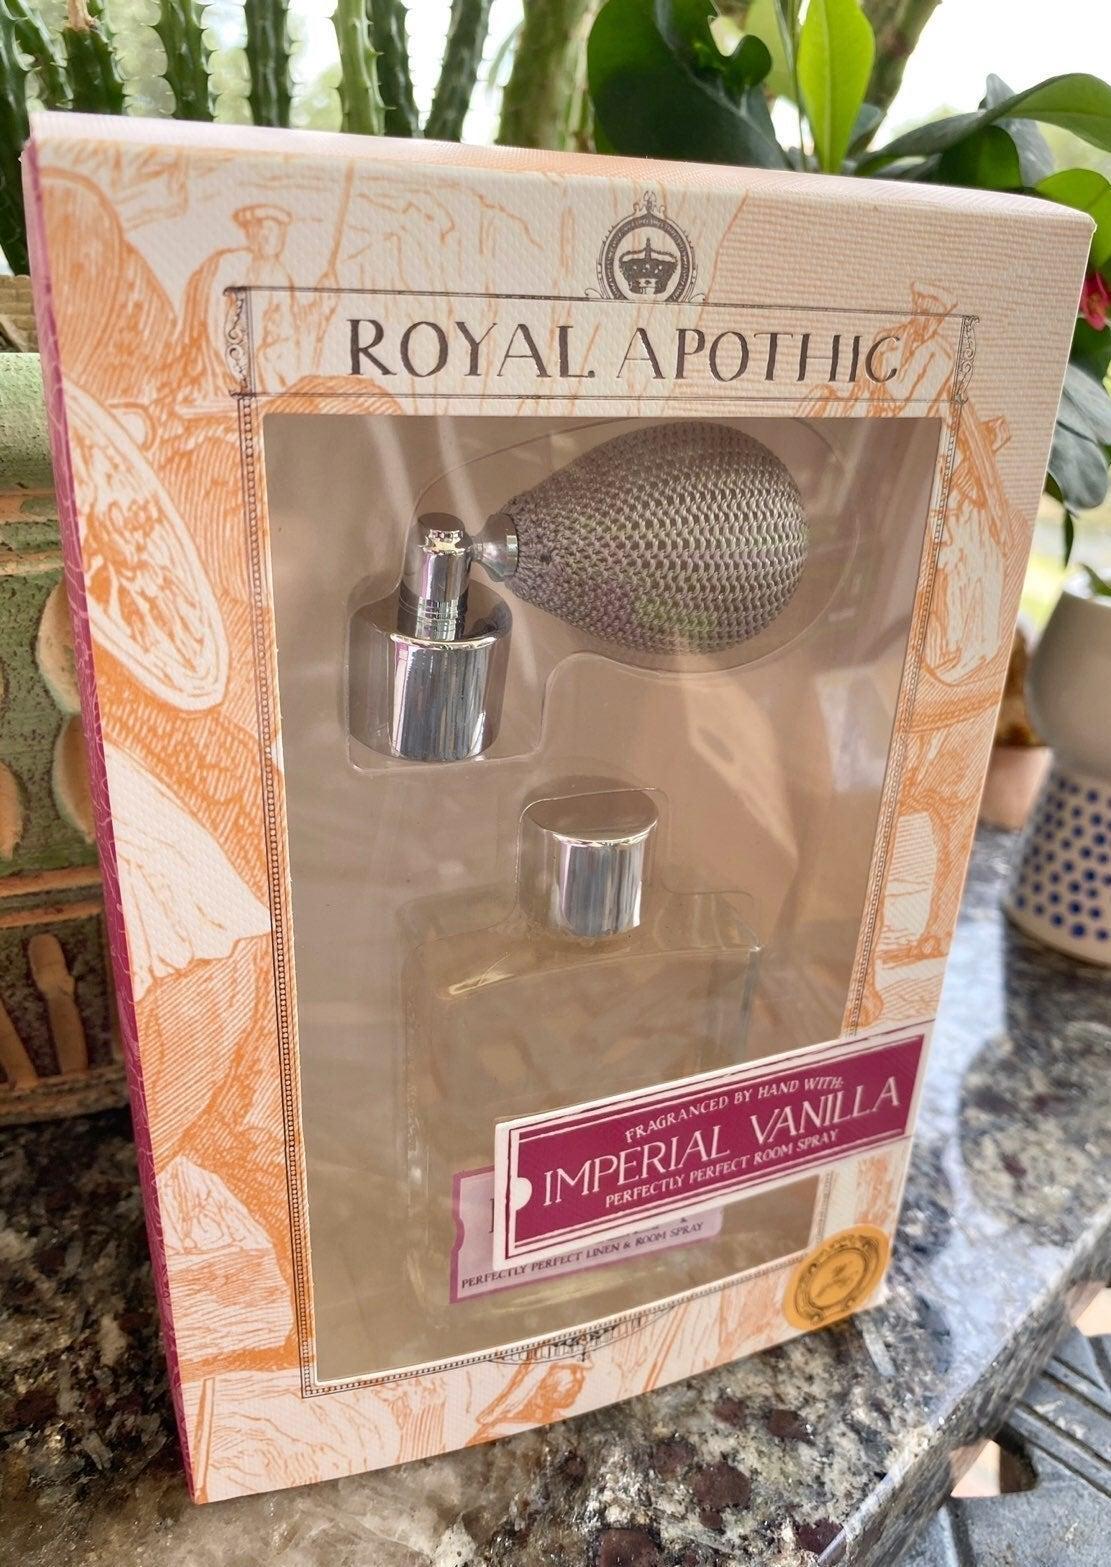 Royal Apothic IMPERIAL VANILLA RoomSpray